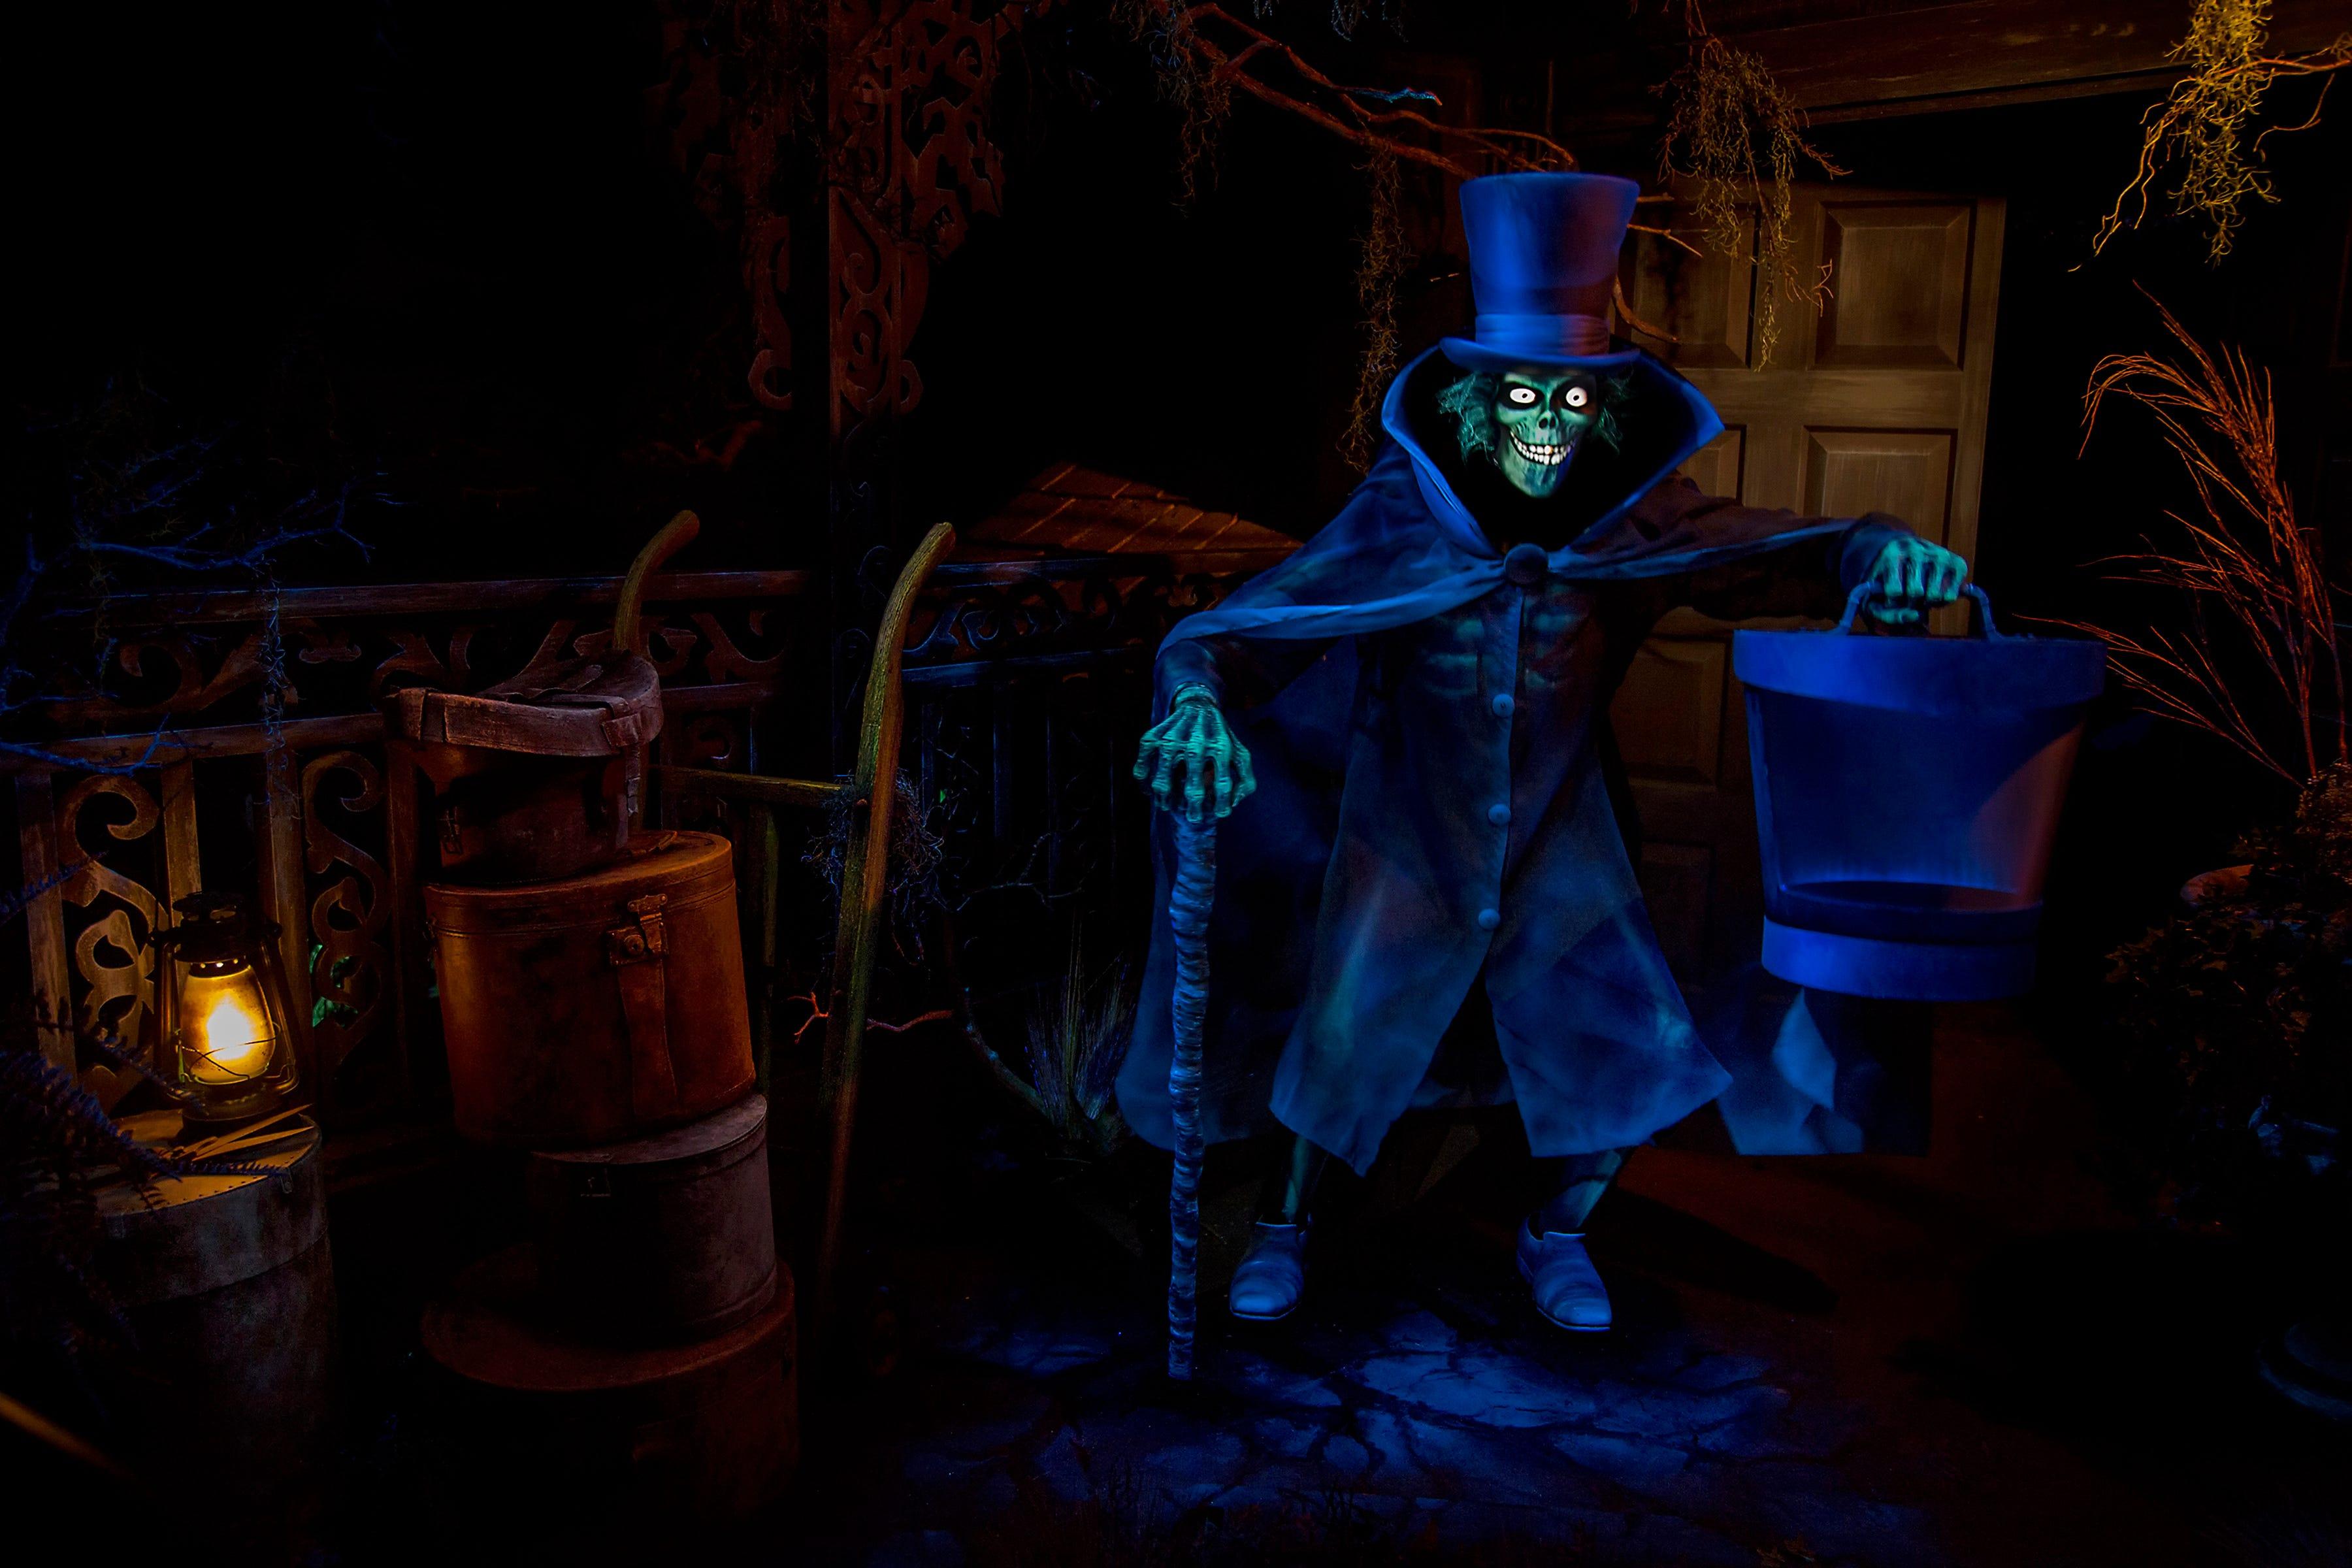 & Disneylandu0027s u0027Hatbox Ghostu0027 mystery solved